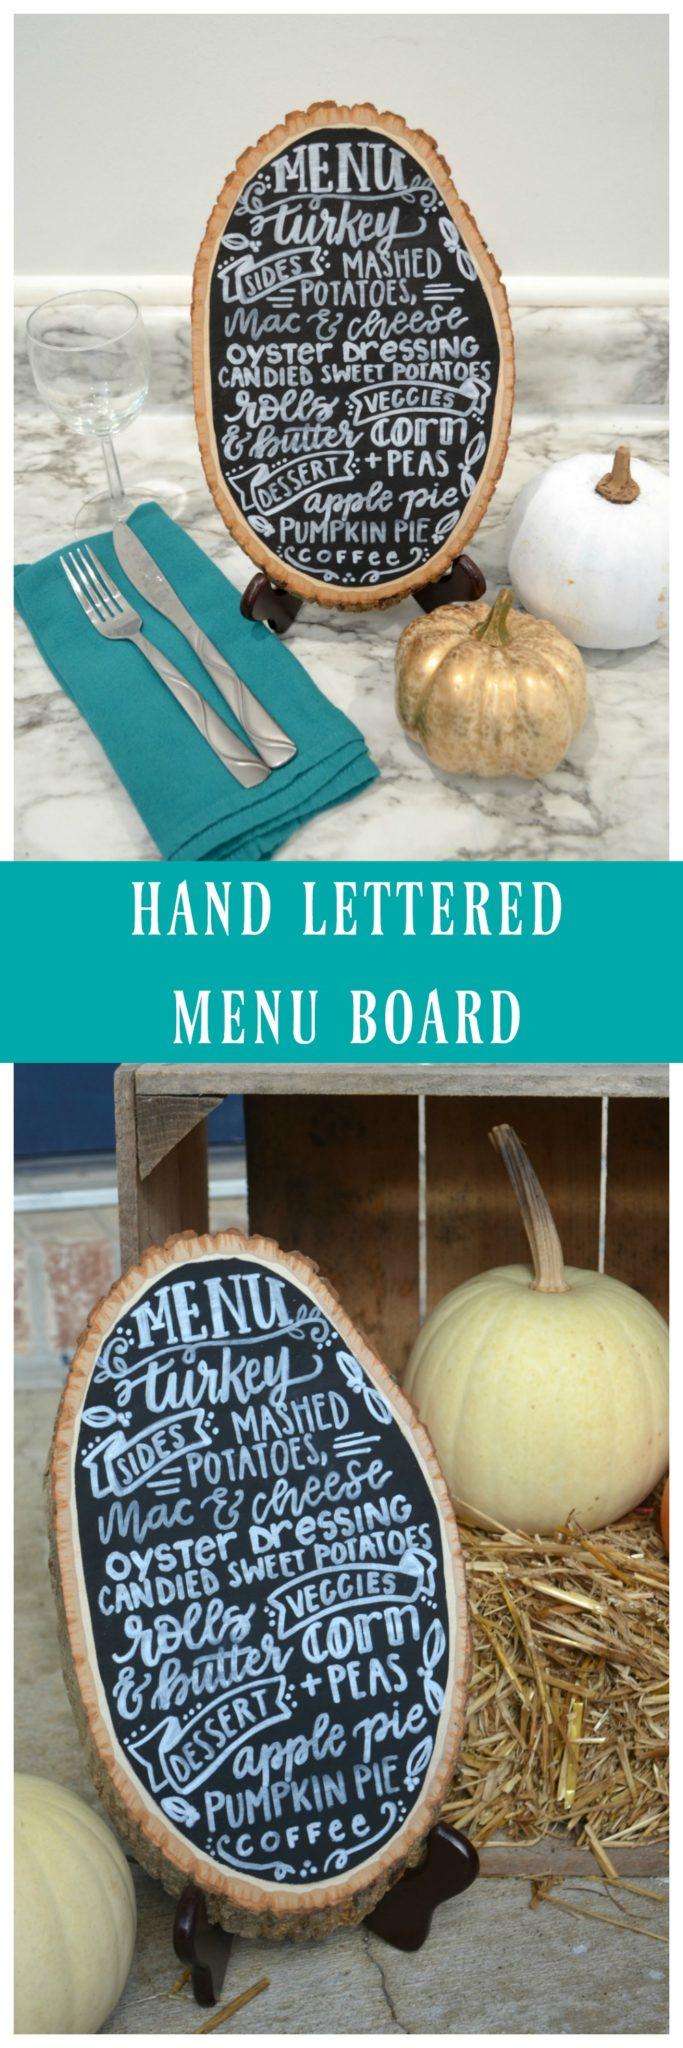 Hand Lettered Menu Board